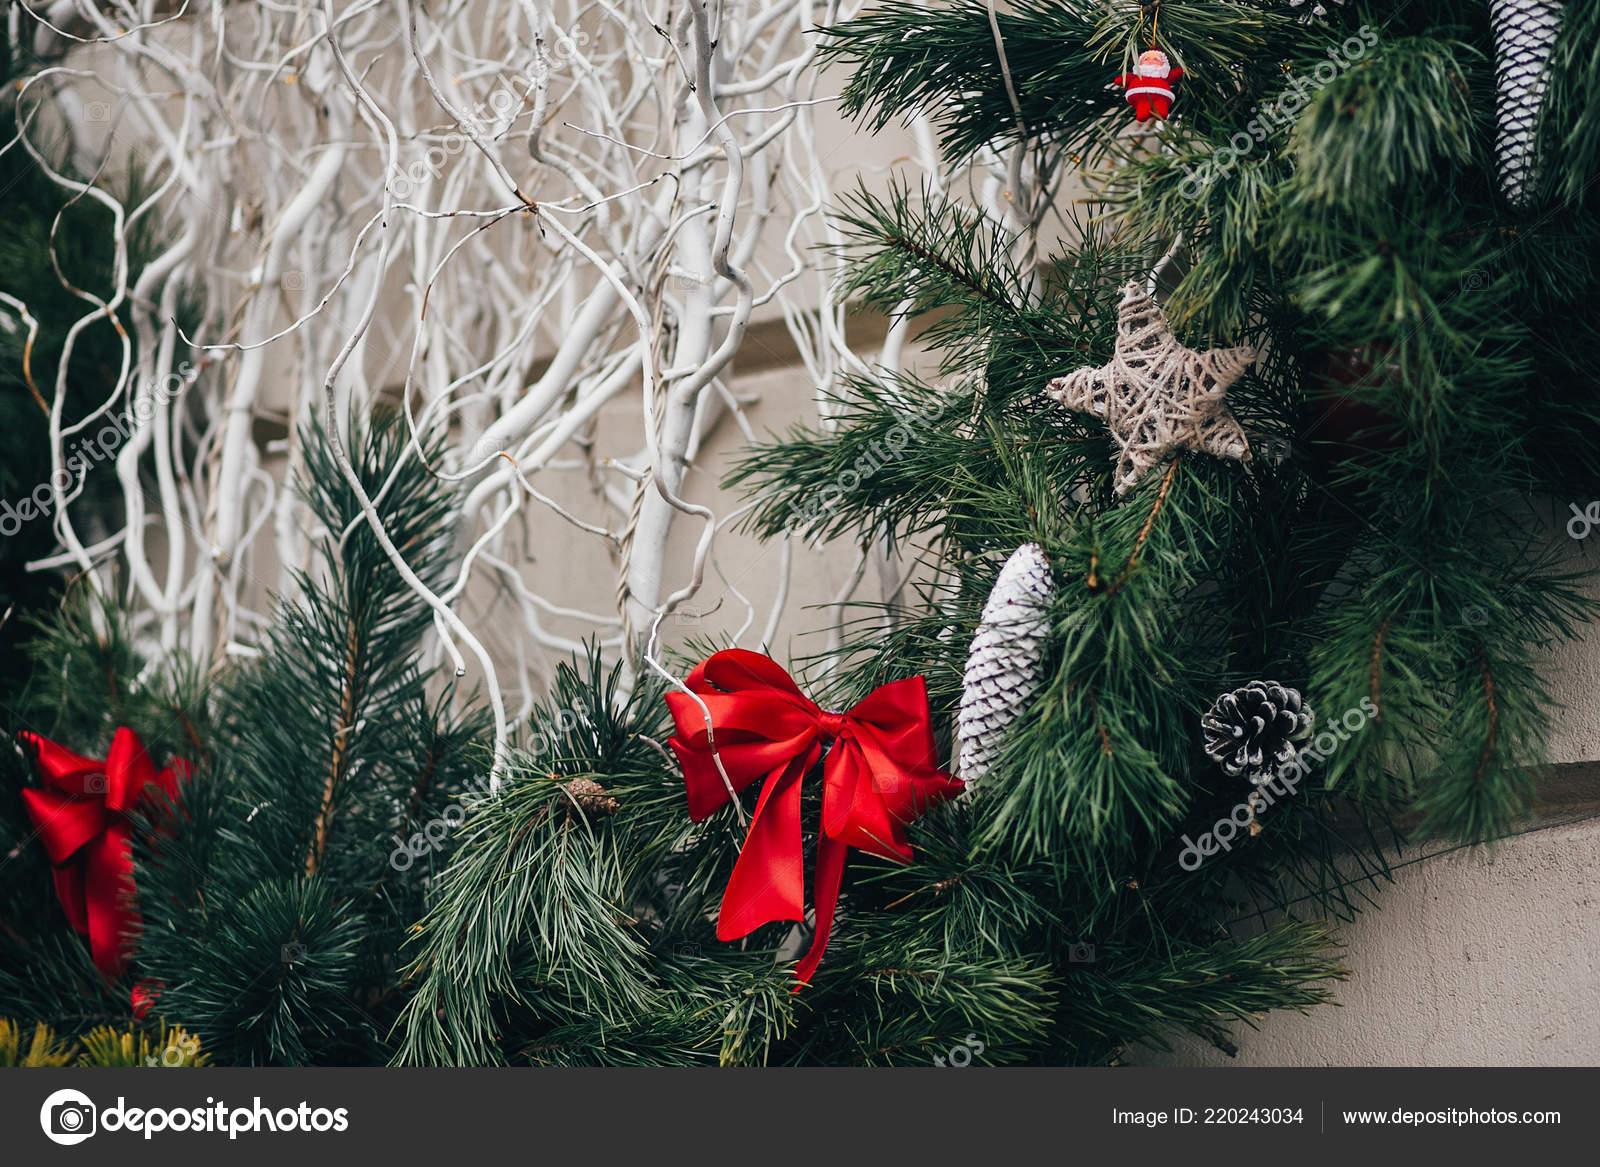 Stylish Christmas Decorations Green Christmas Wreath Red Bows Ornaments Pine Stock Photo C Sonyachny 220243034